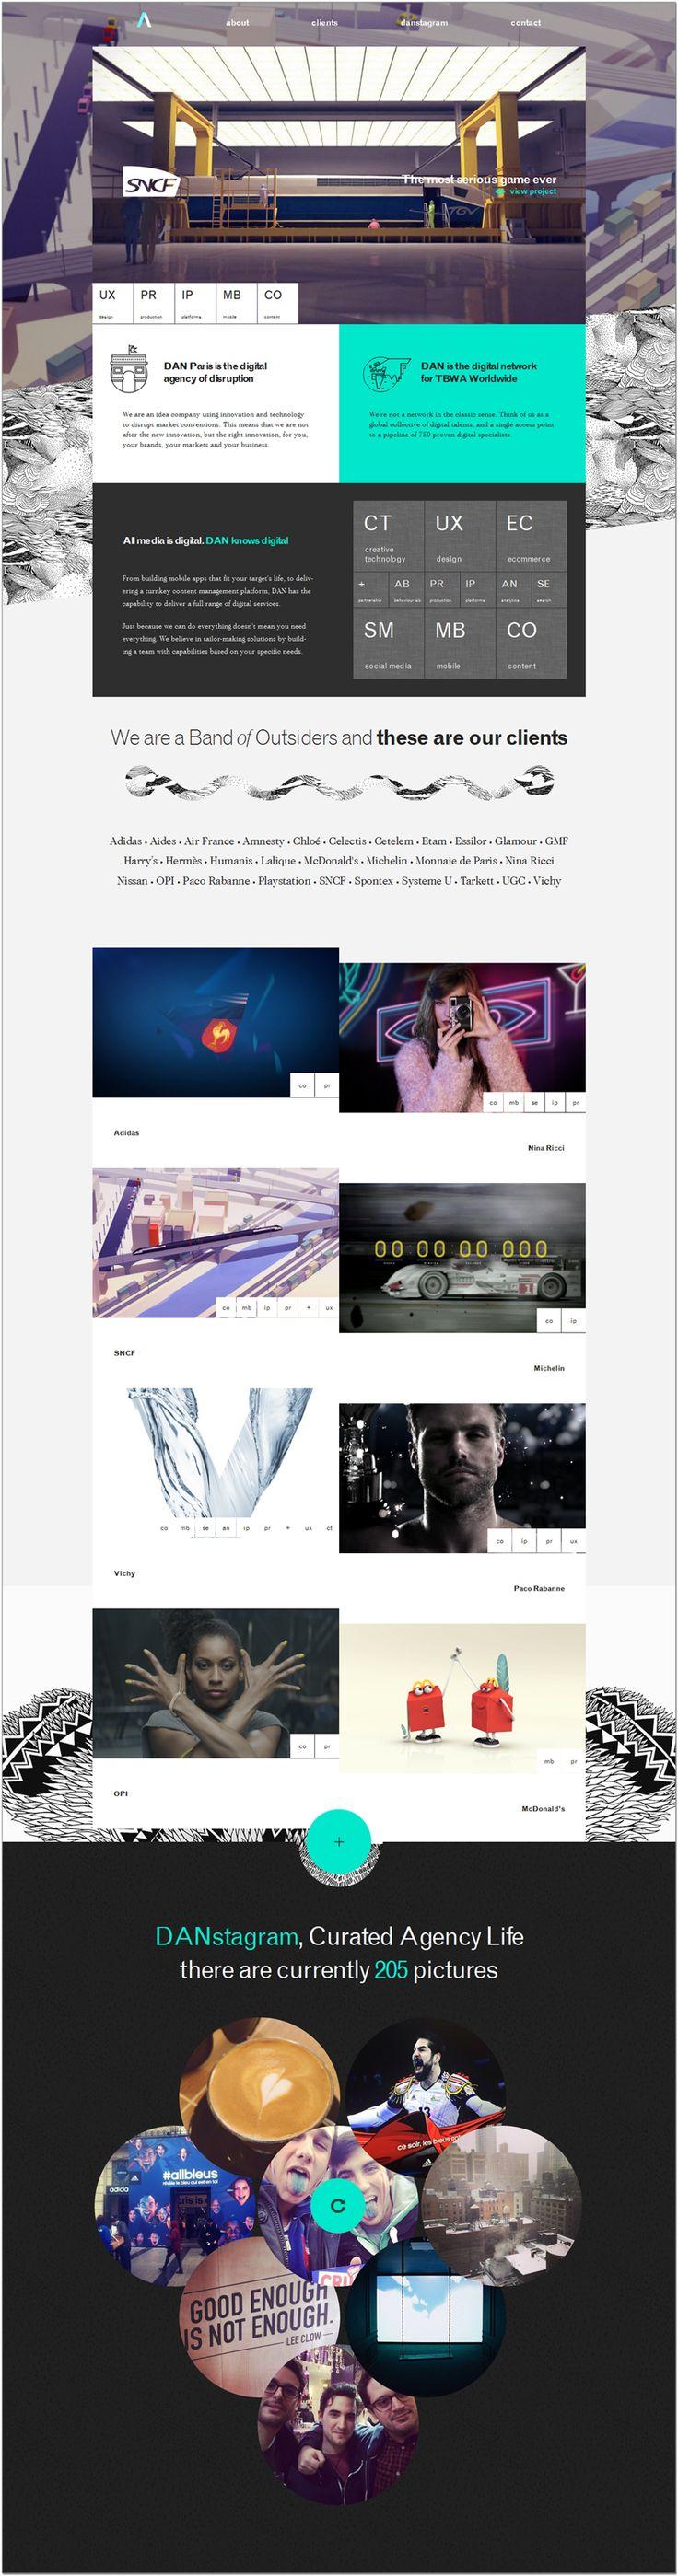 DAN Paris #creative #website #webdesign #design #web #internet #site #webdesigner #designer #layout #template #theme #pikock www.pikock.com #ui #ux